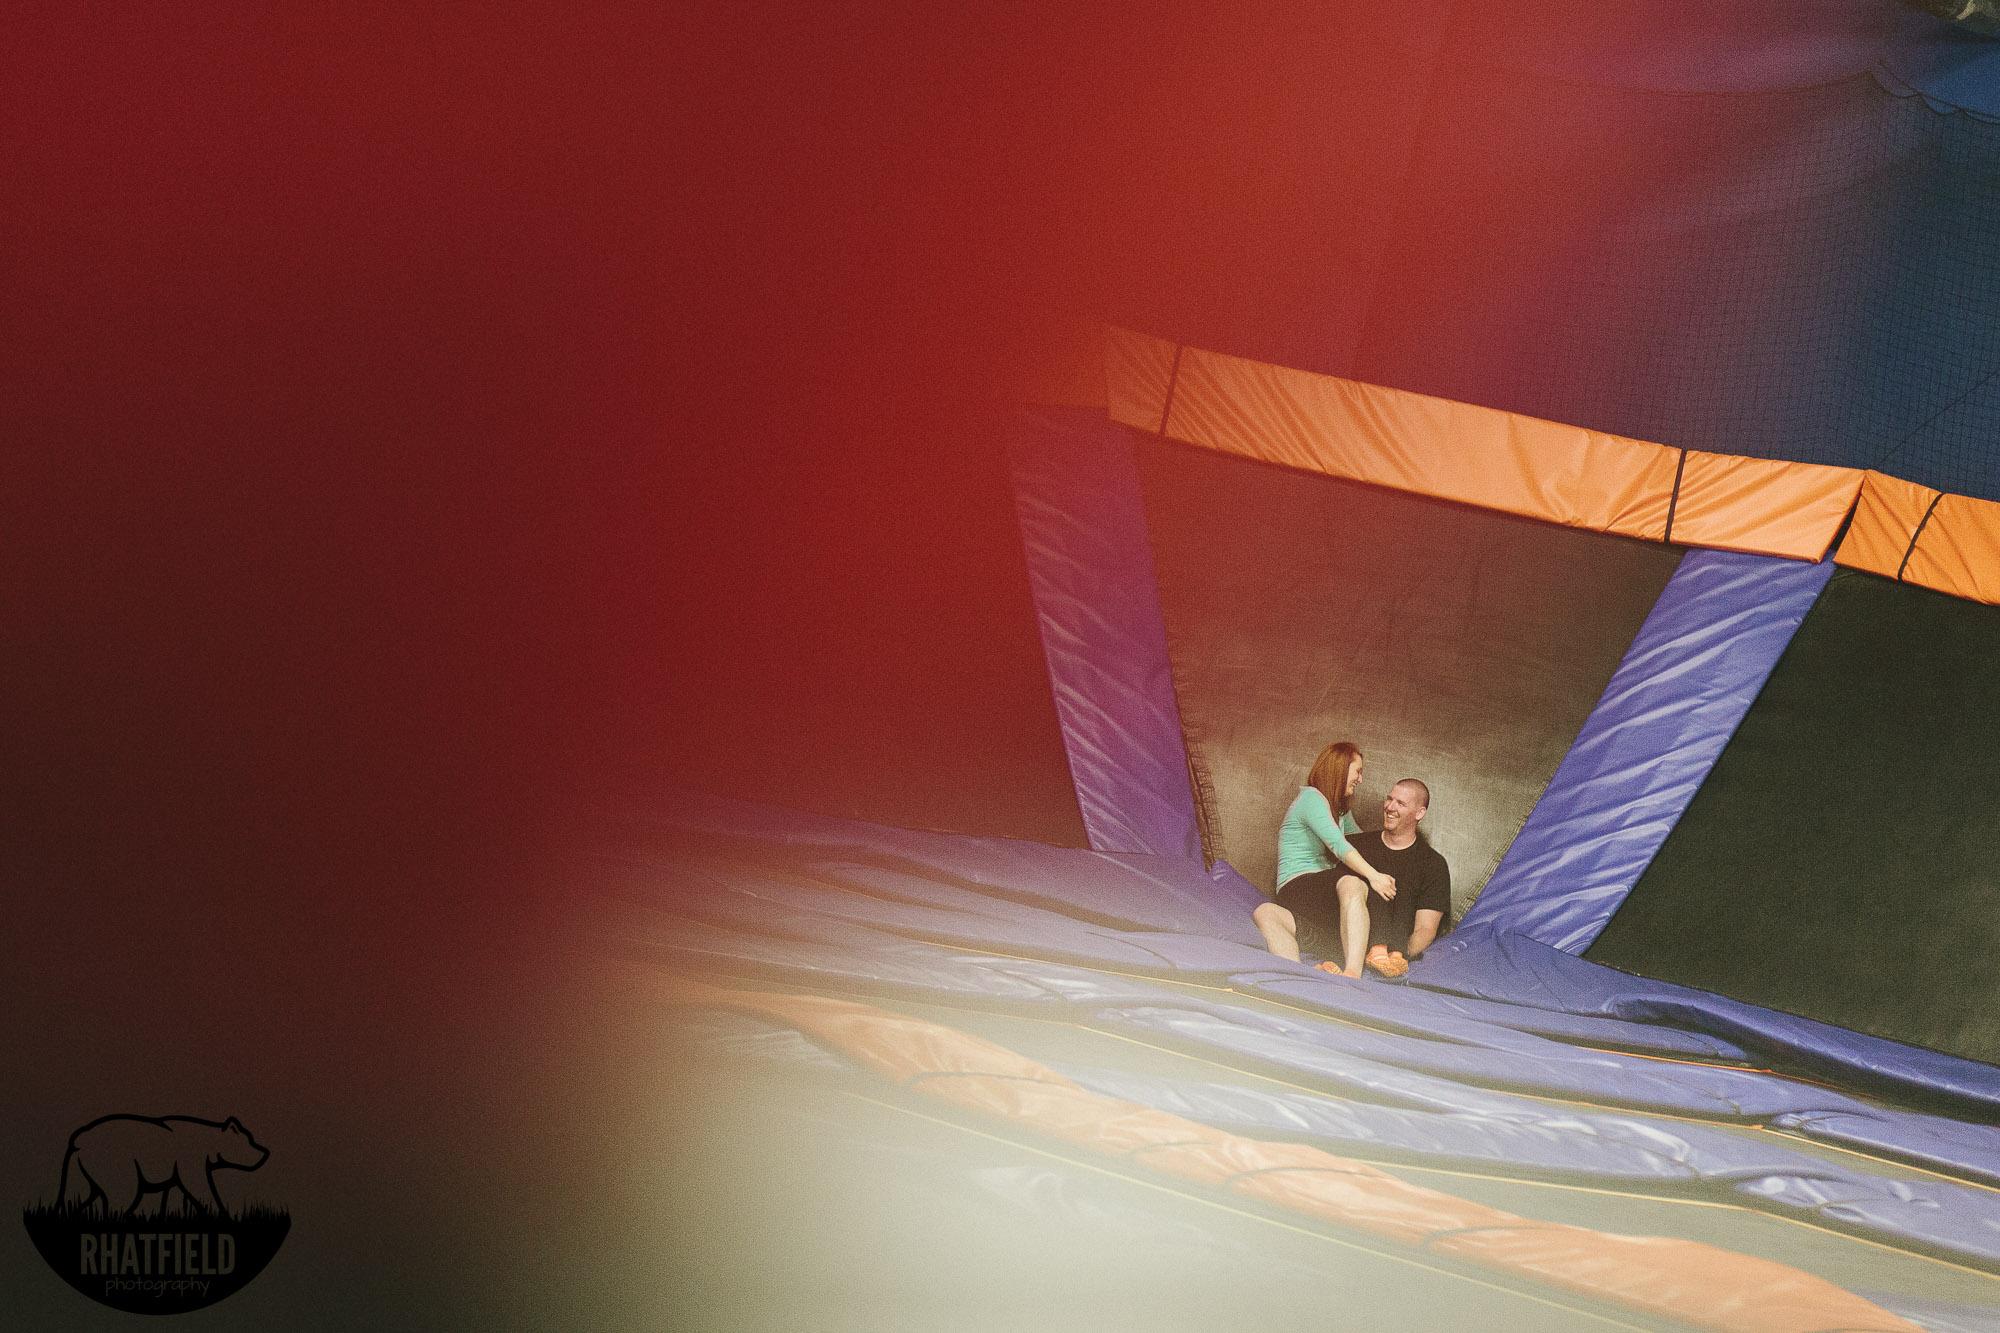 cuddling-trampoline-park